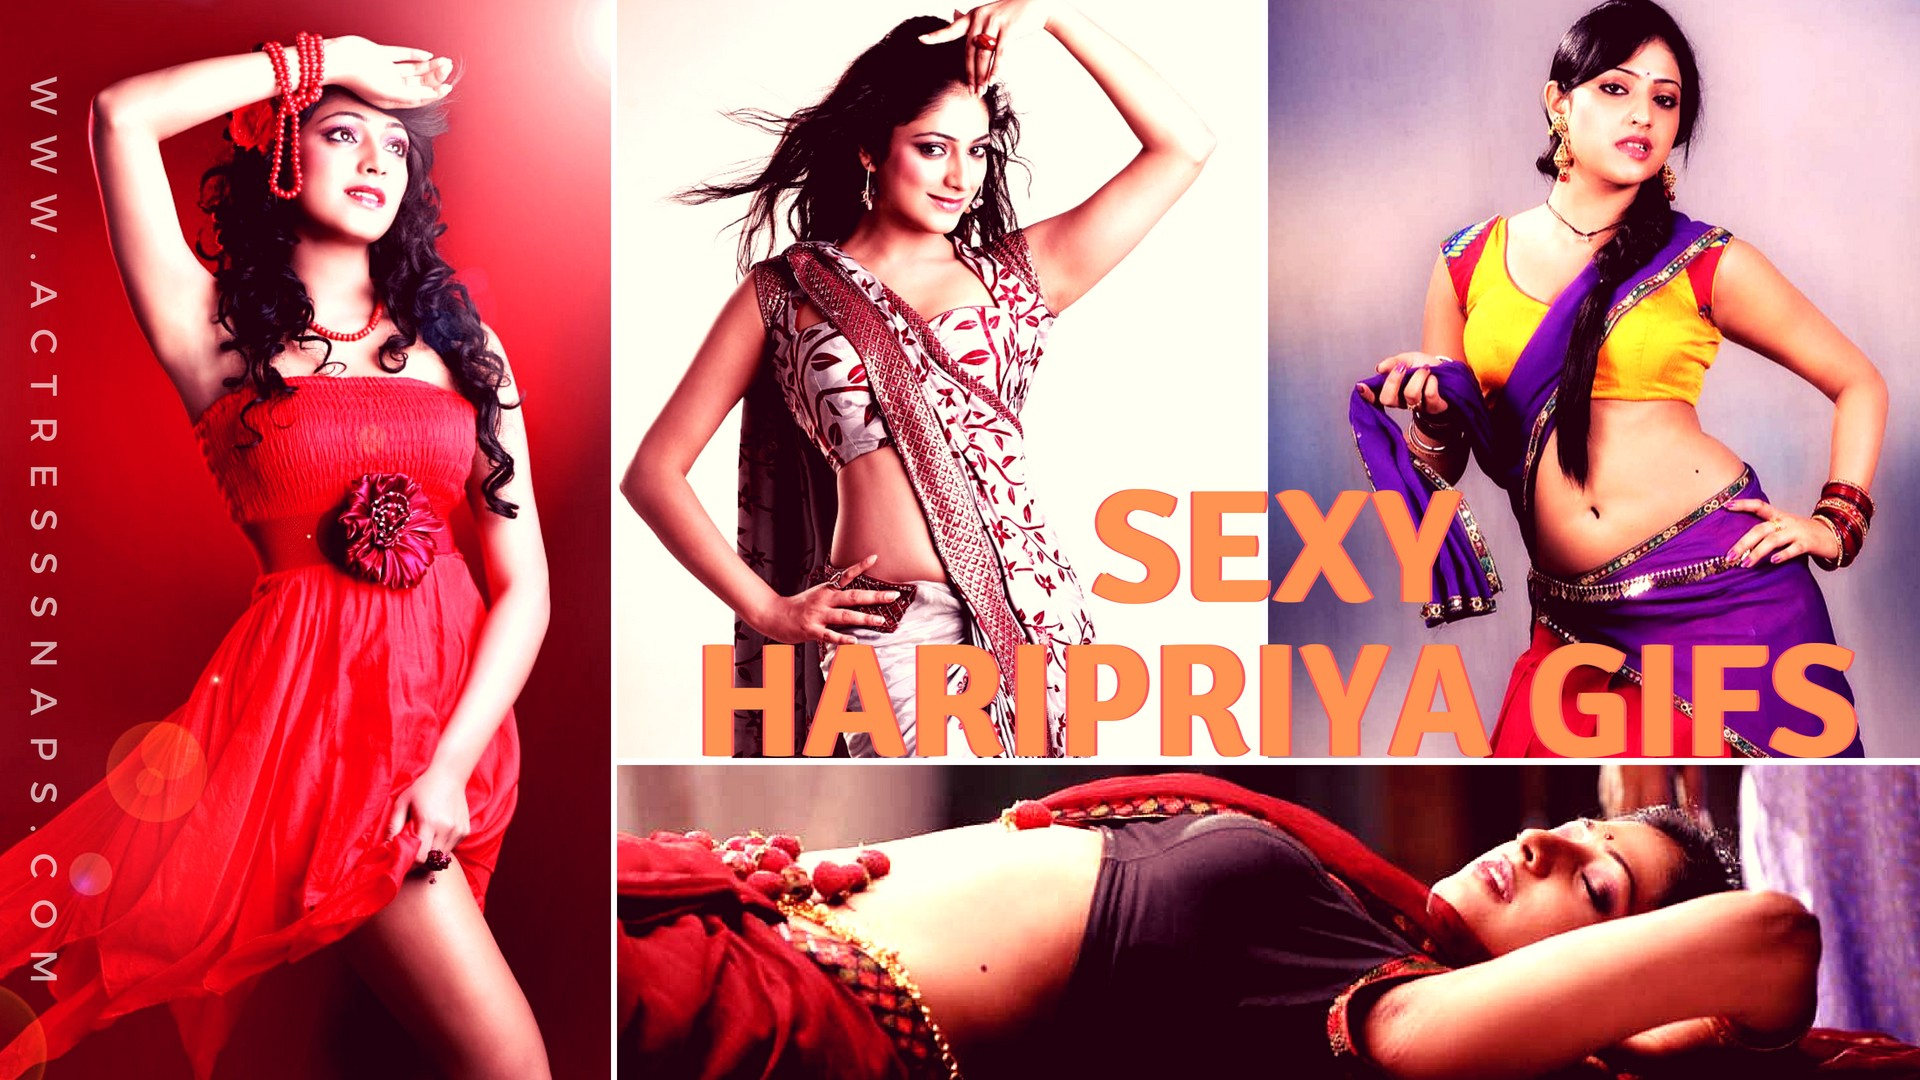 Sexy Actress Haripriya GIFs - Sexy Actress Pictures | Hot Actress Pictures - ActressSnaps.com